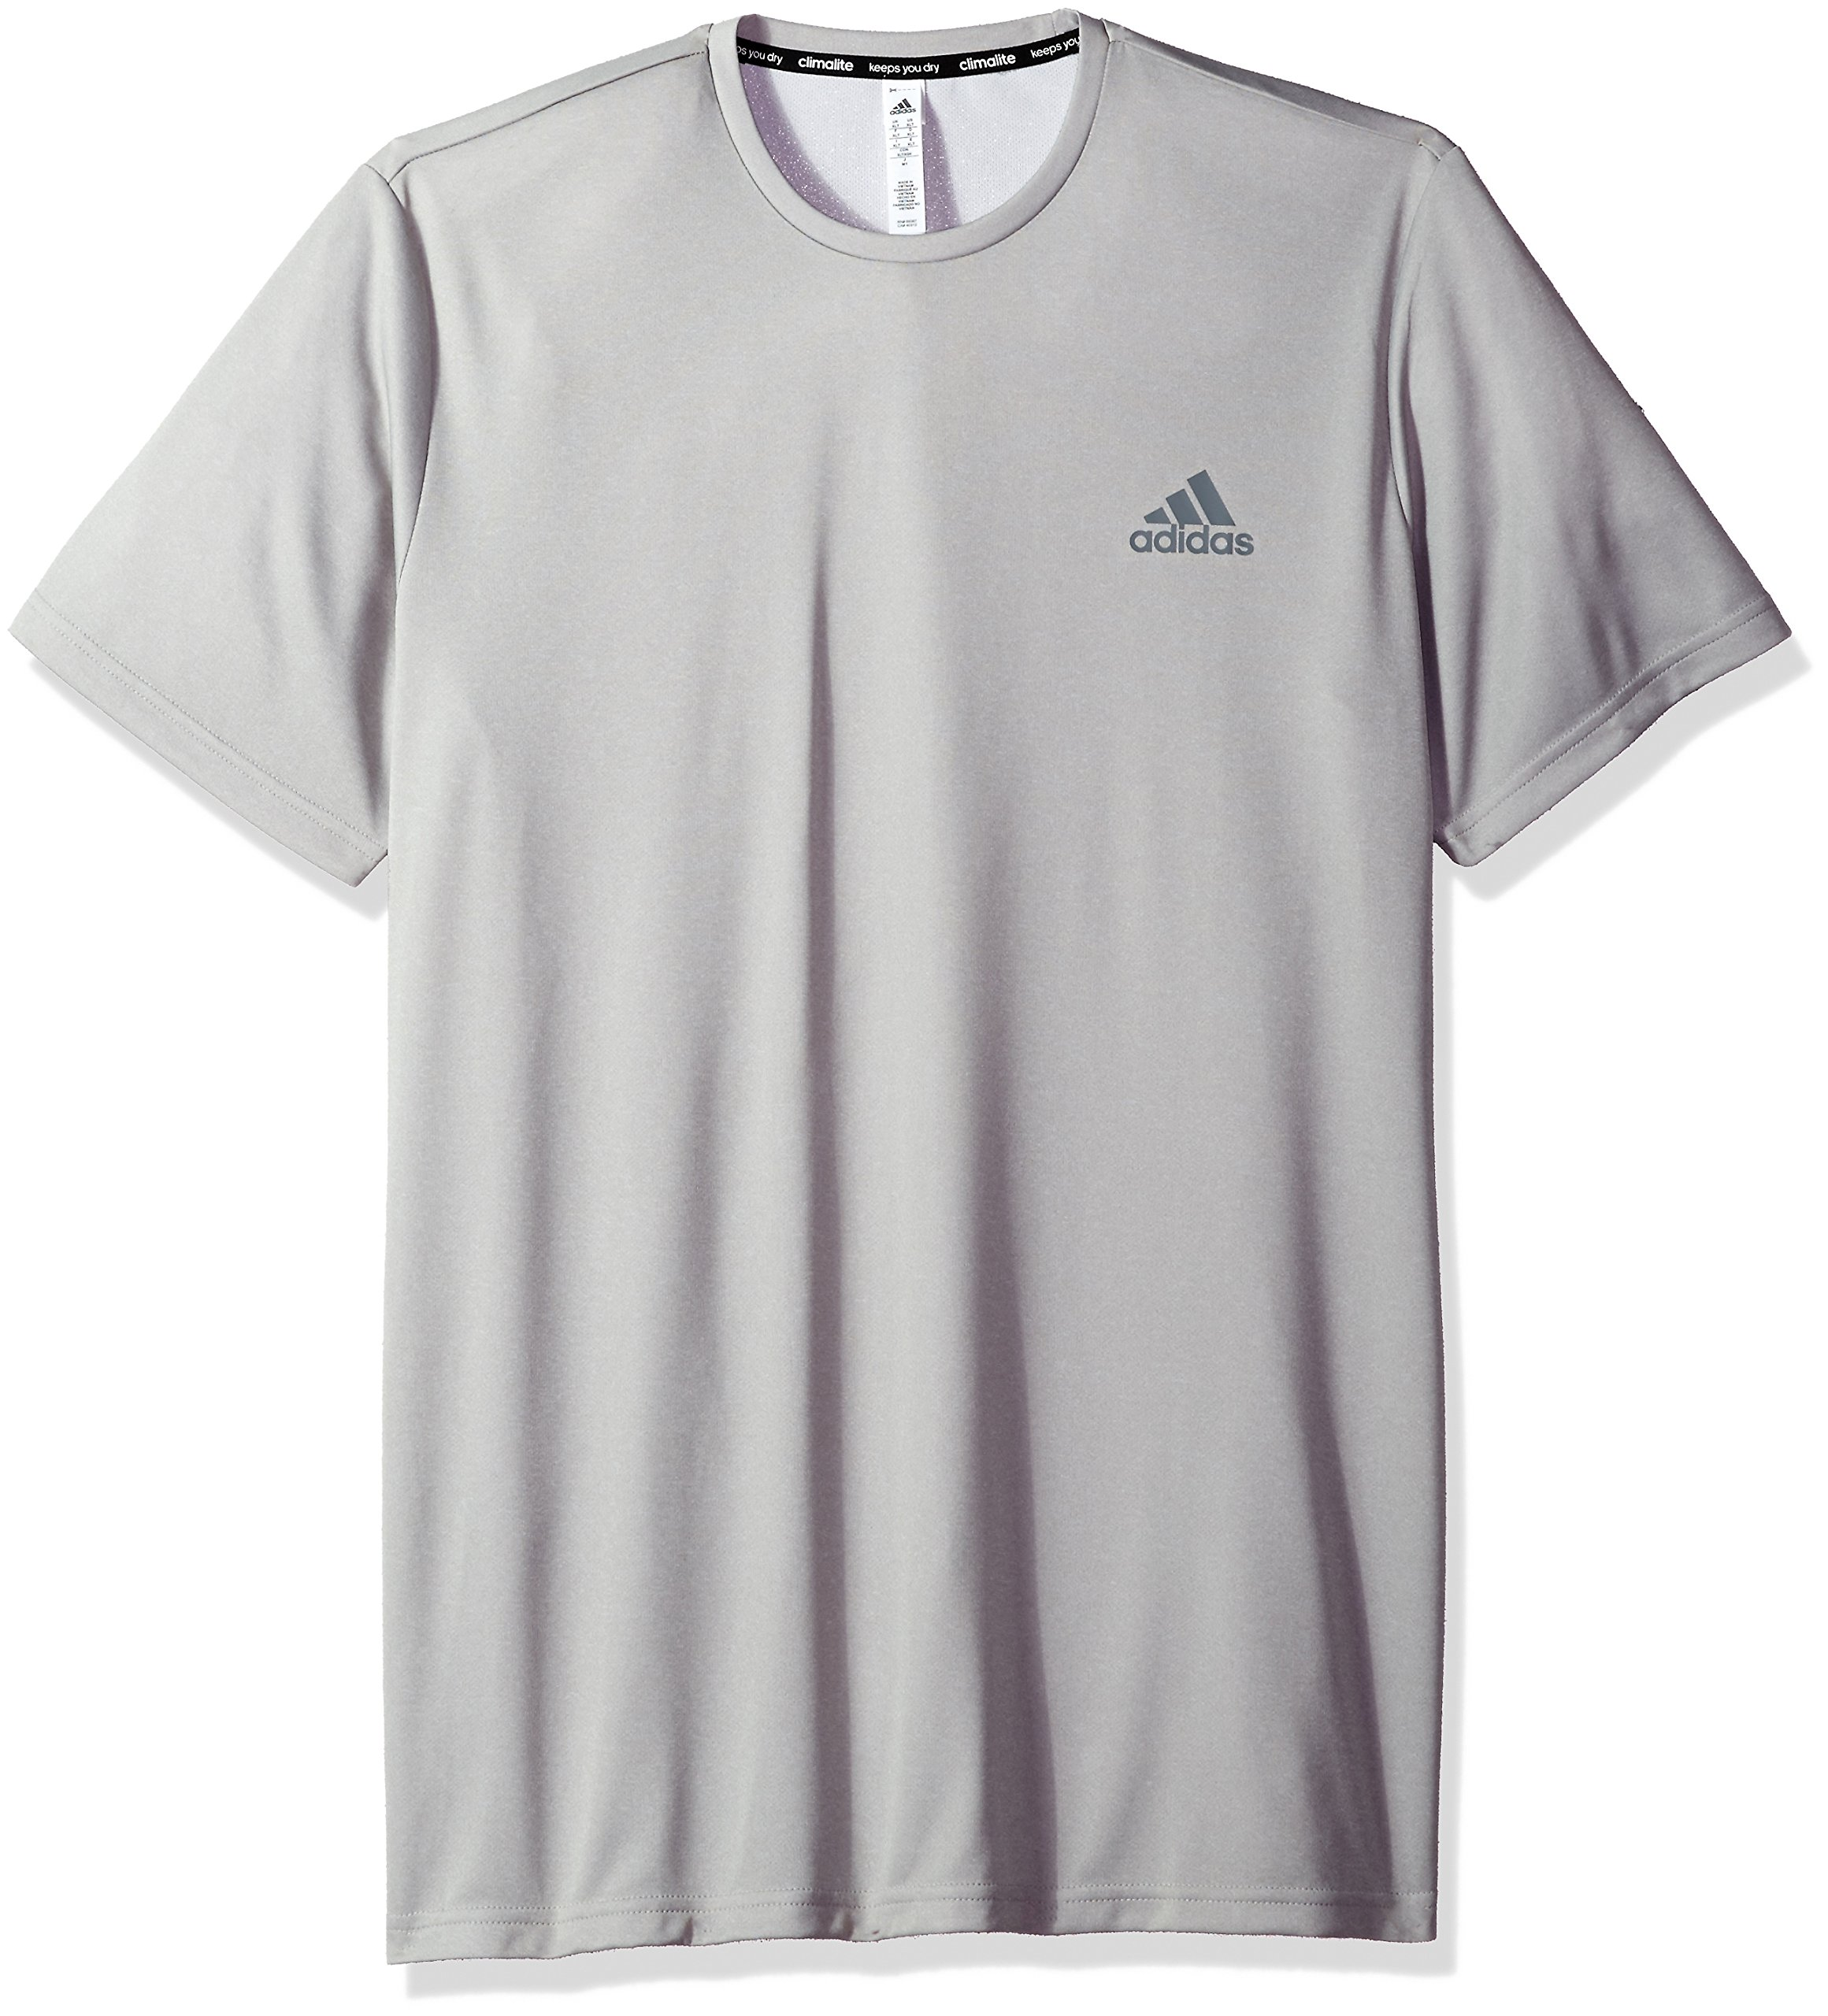 adidas Men's Essentials Tech Big & Tall Tee, Medium Grey Heather, 3X-Large Tall